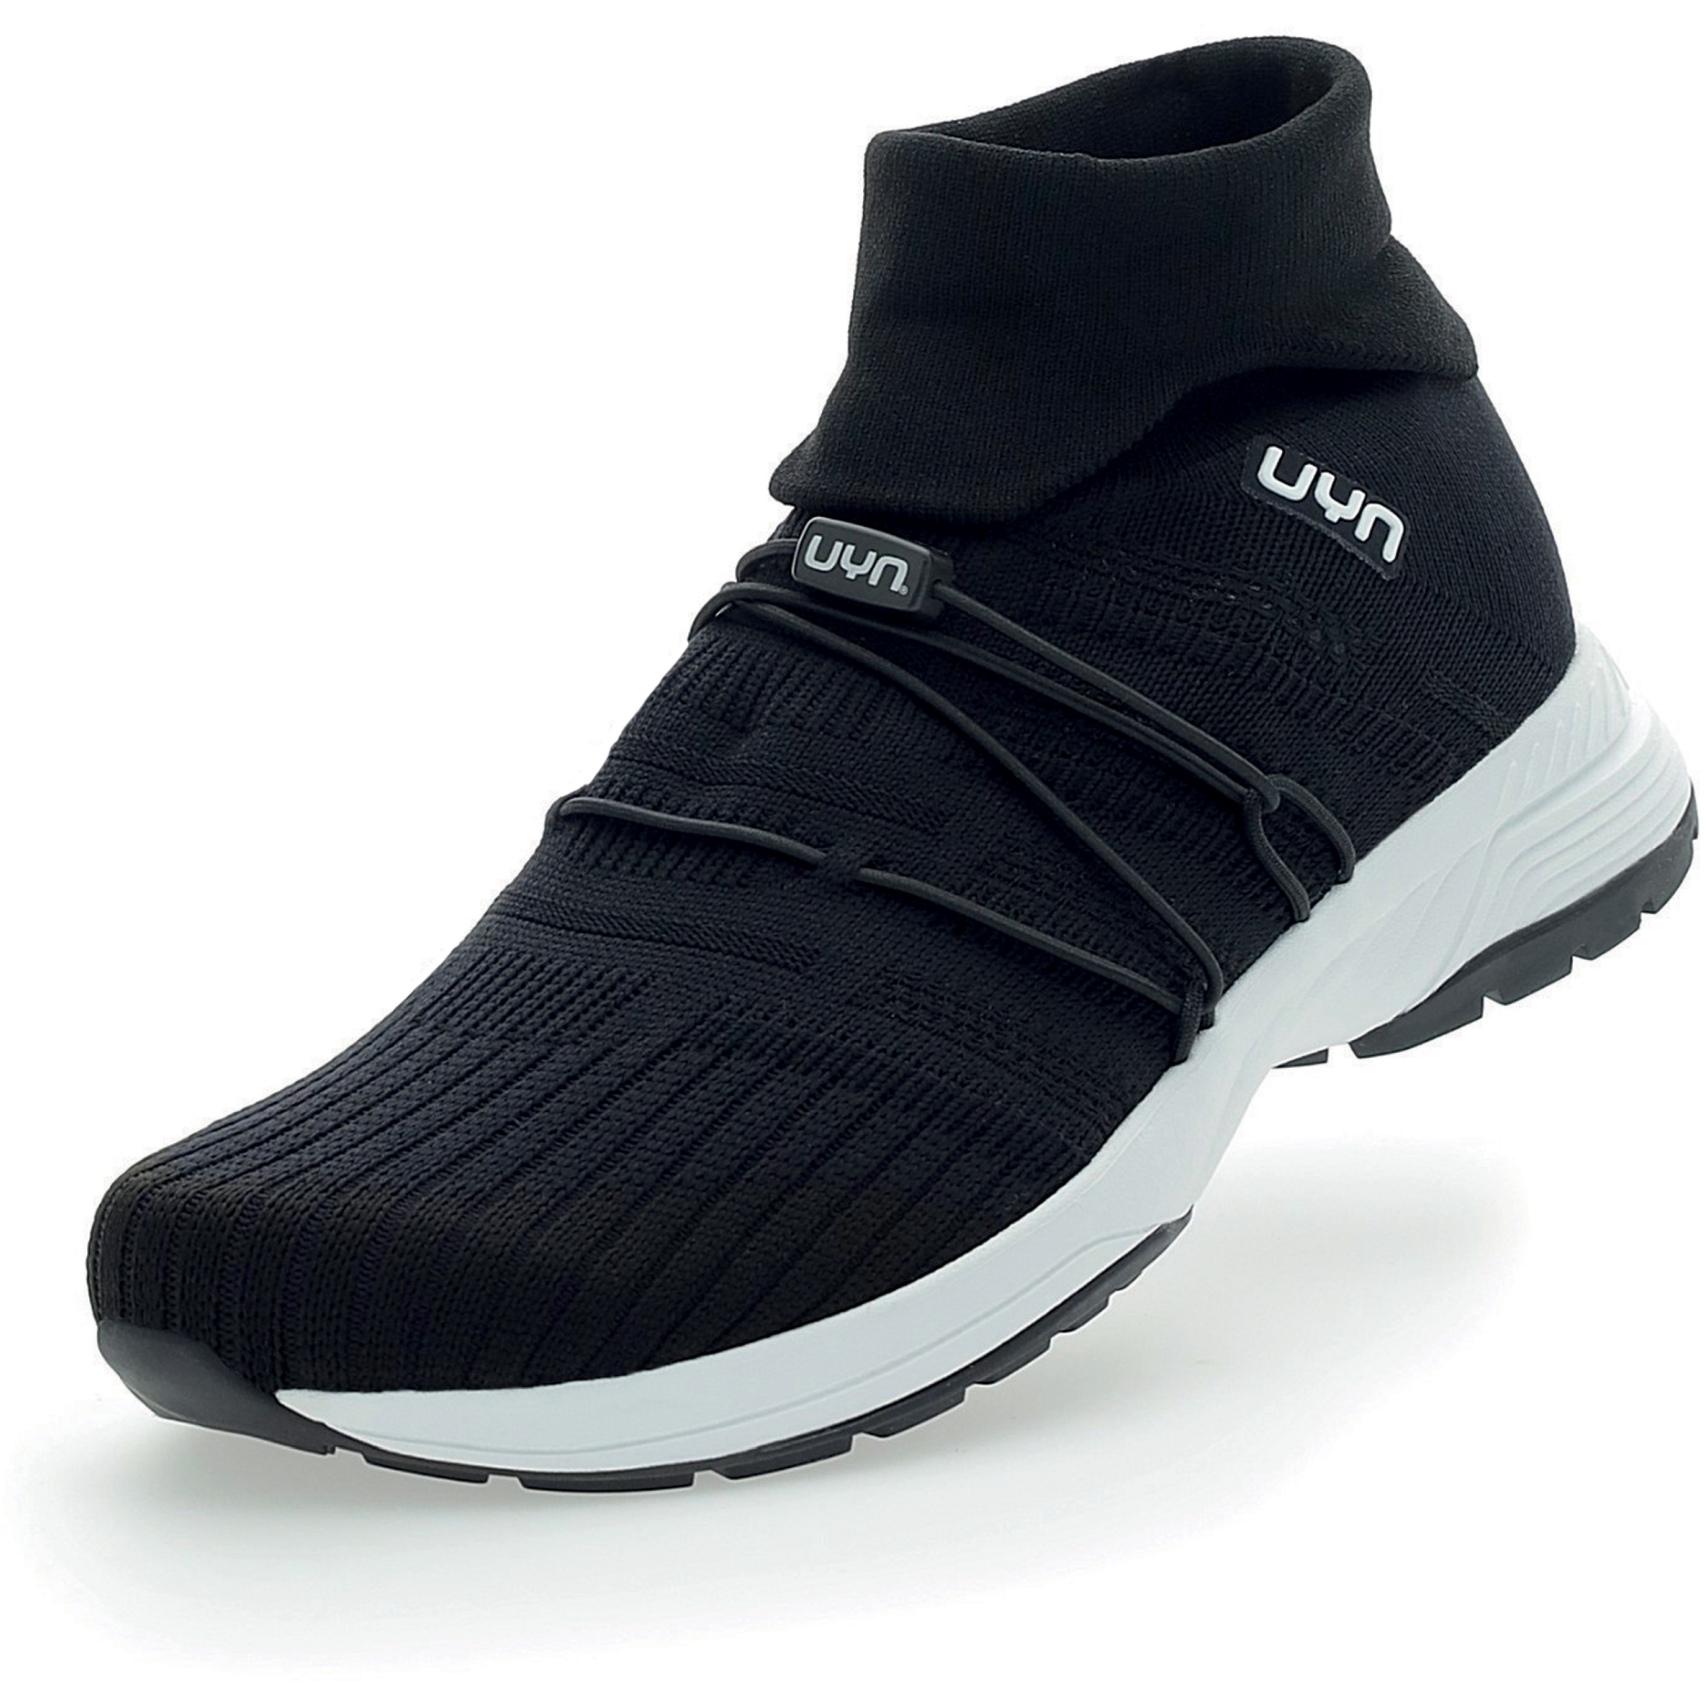 UYN Free Flow Tune High Running Shoes Women - Black